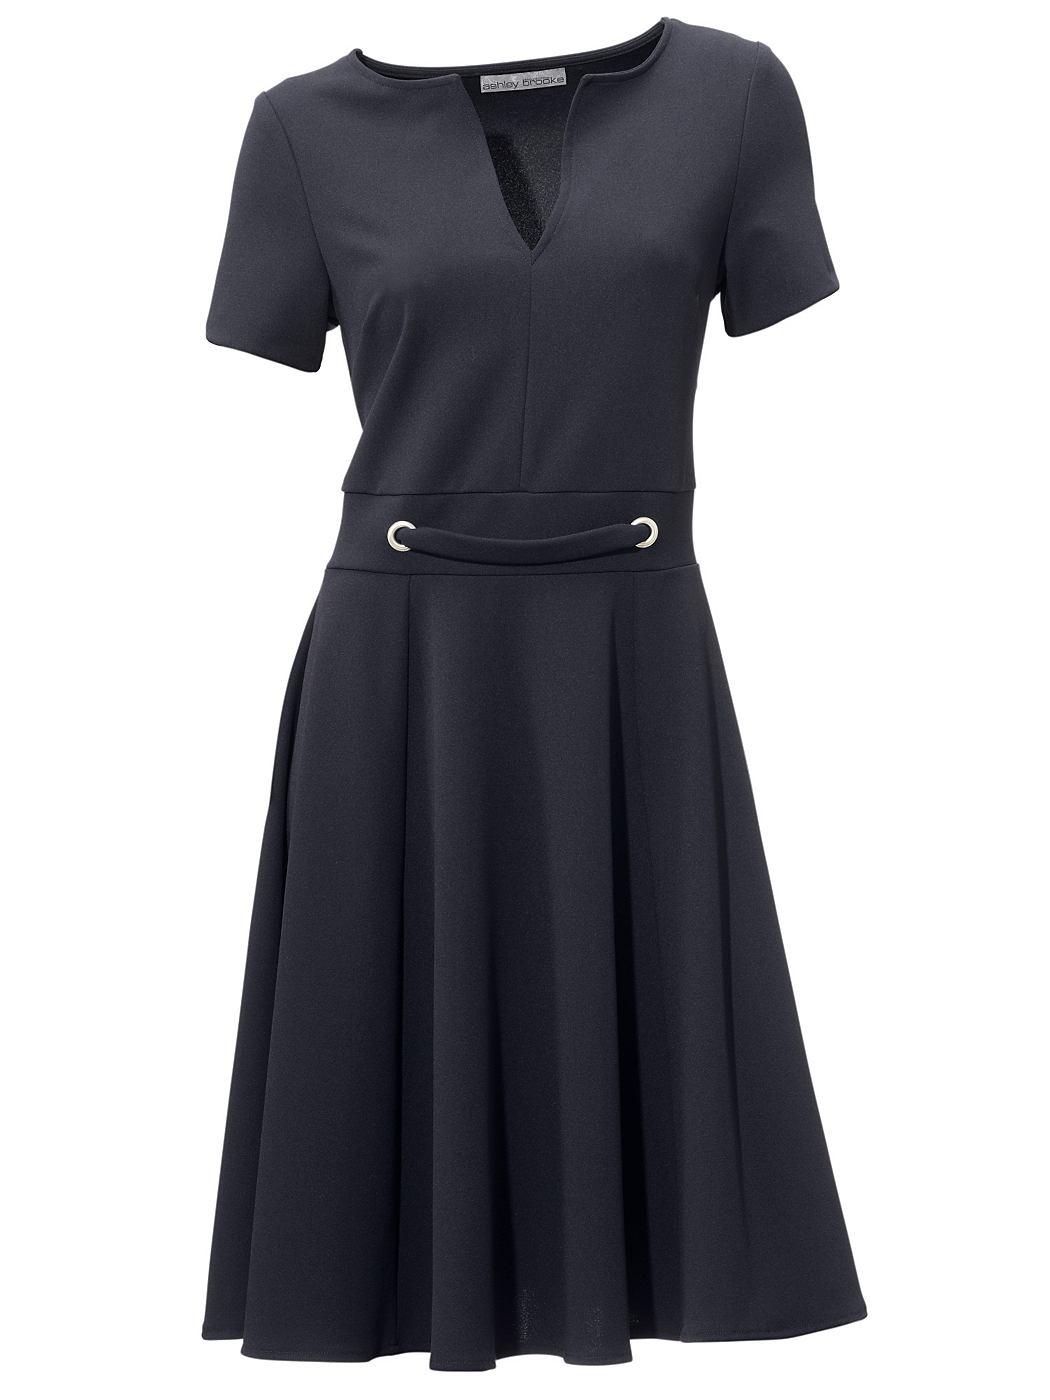 Ashley Brooke jurk blauw